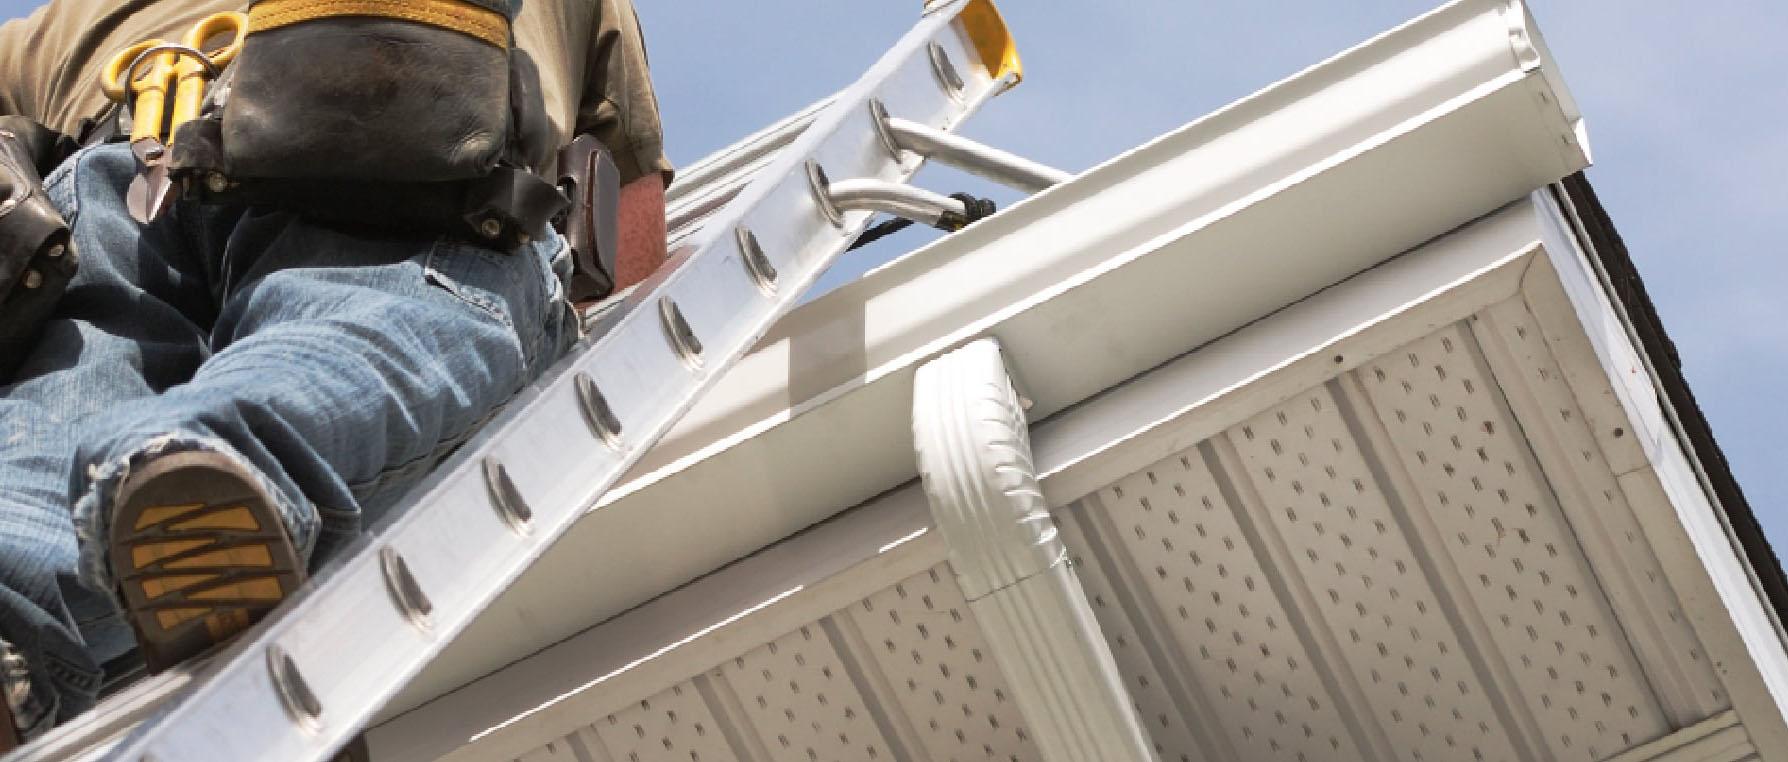 eavestrough contractors install ladder virden manitoba